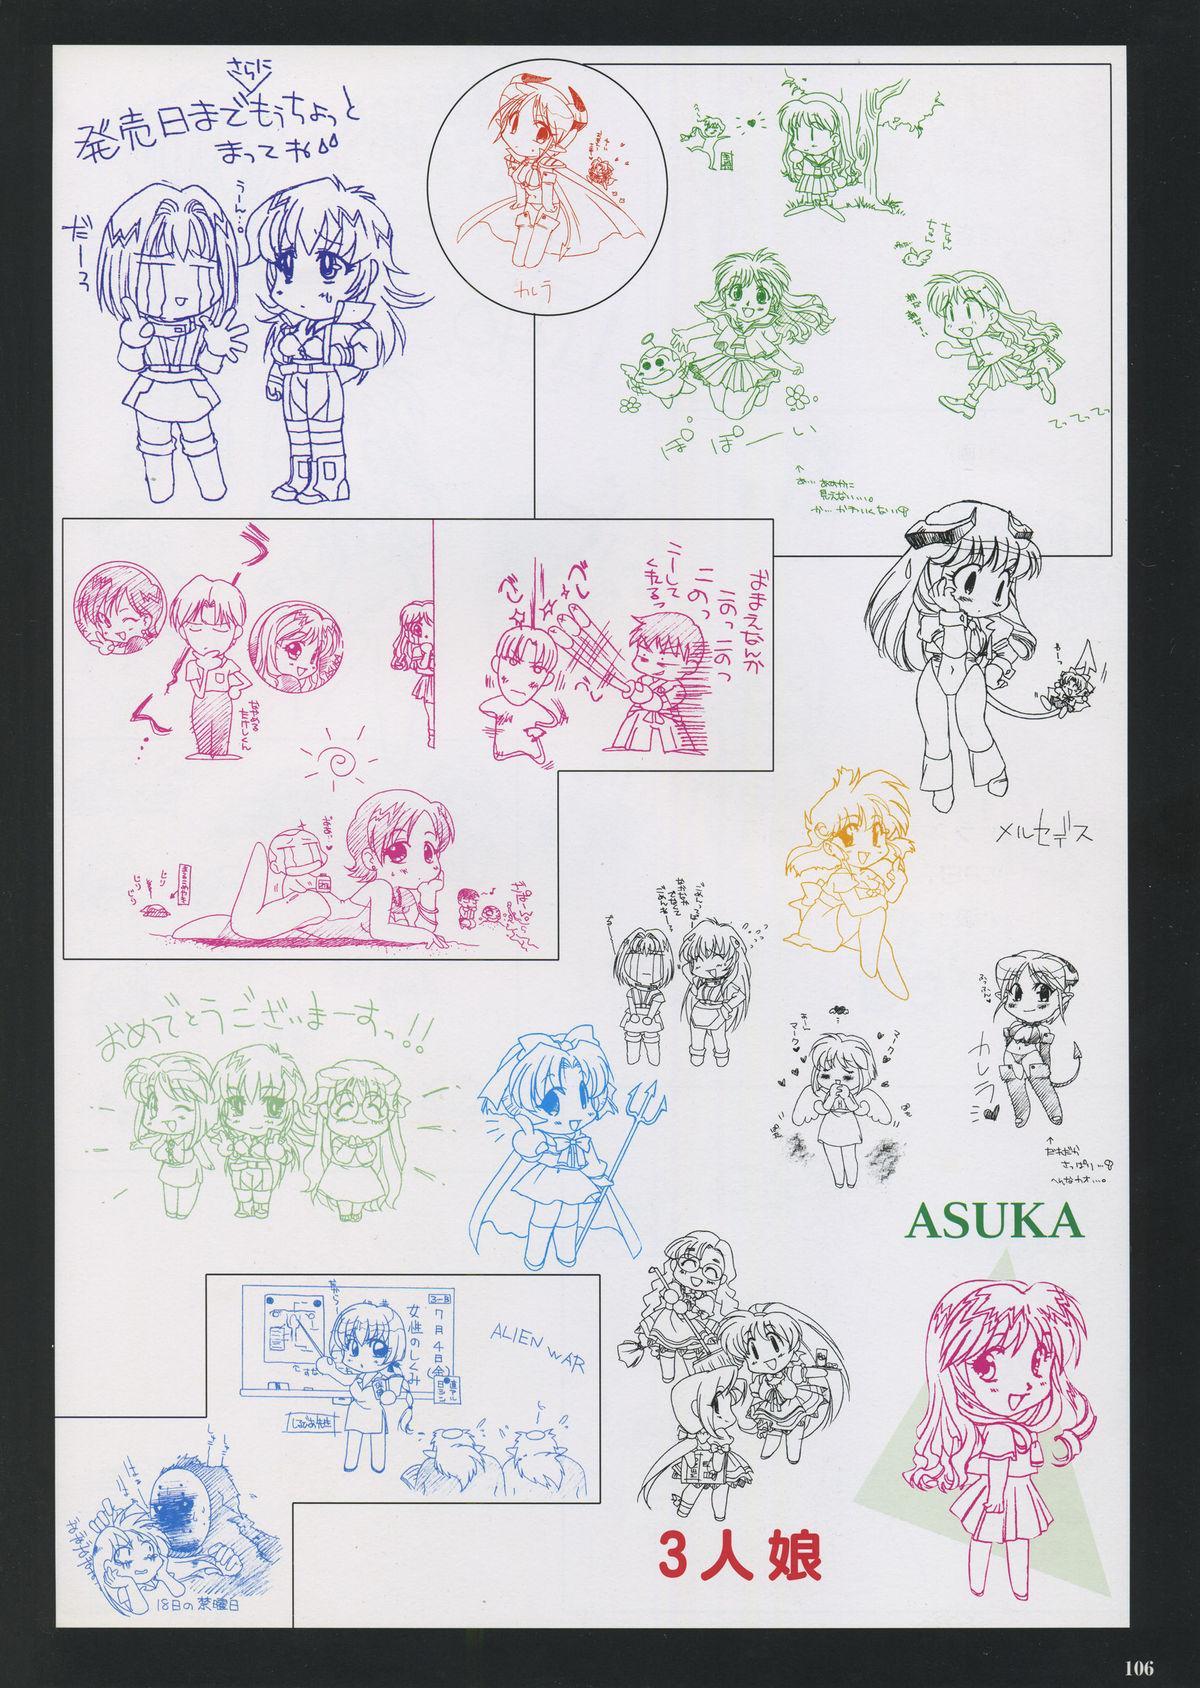 VIPER Series Official Artbook III 108